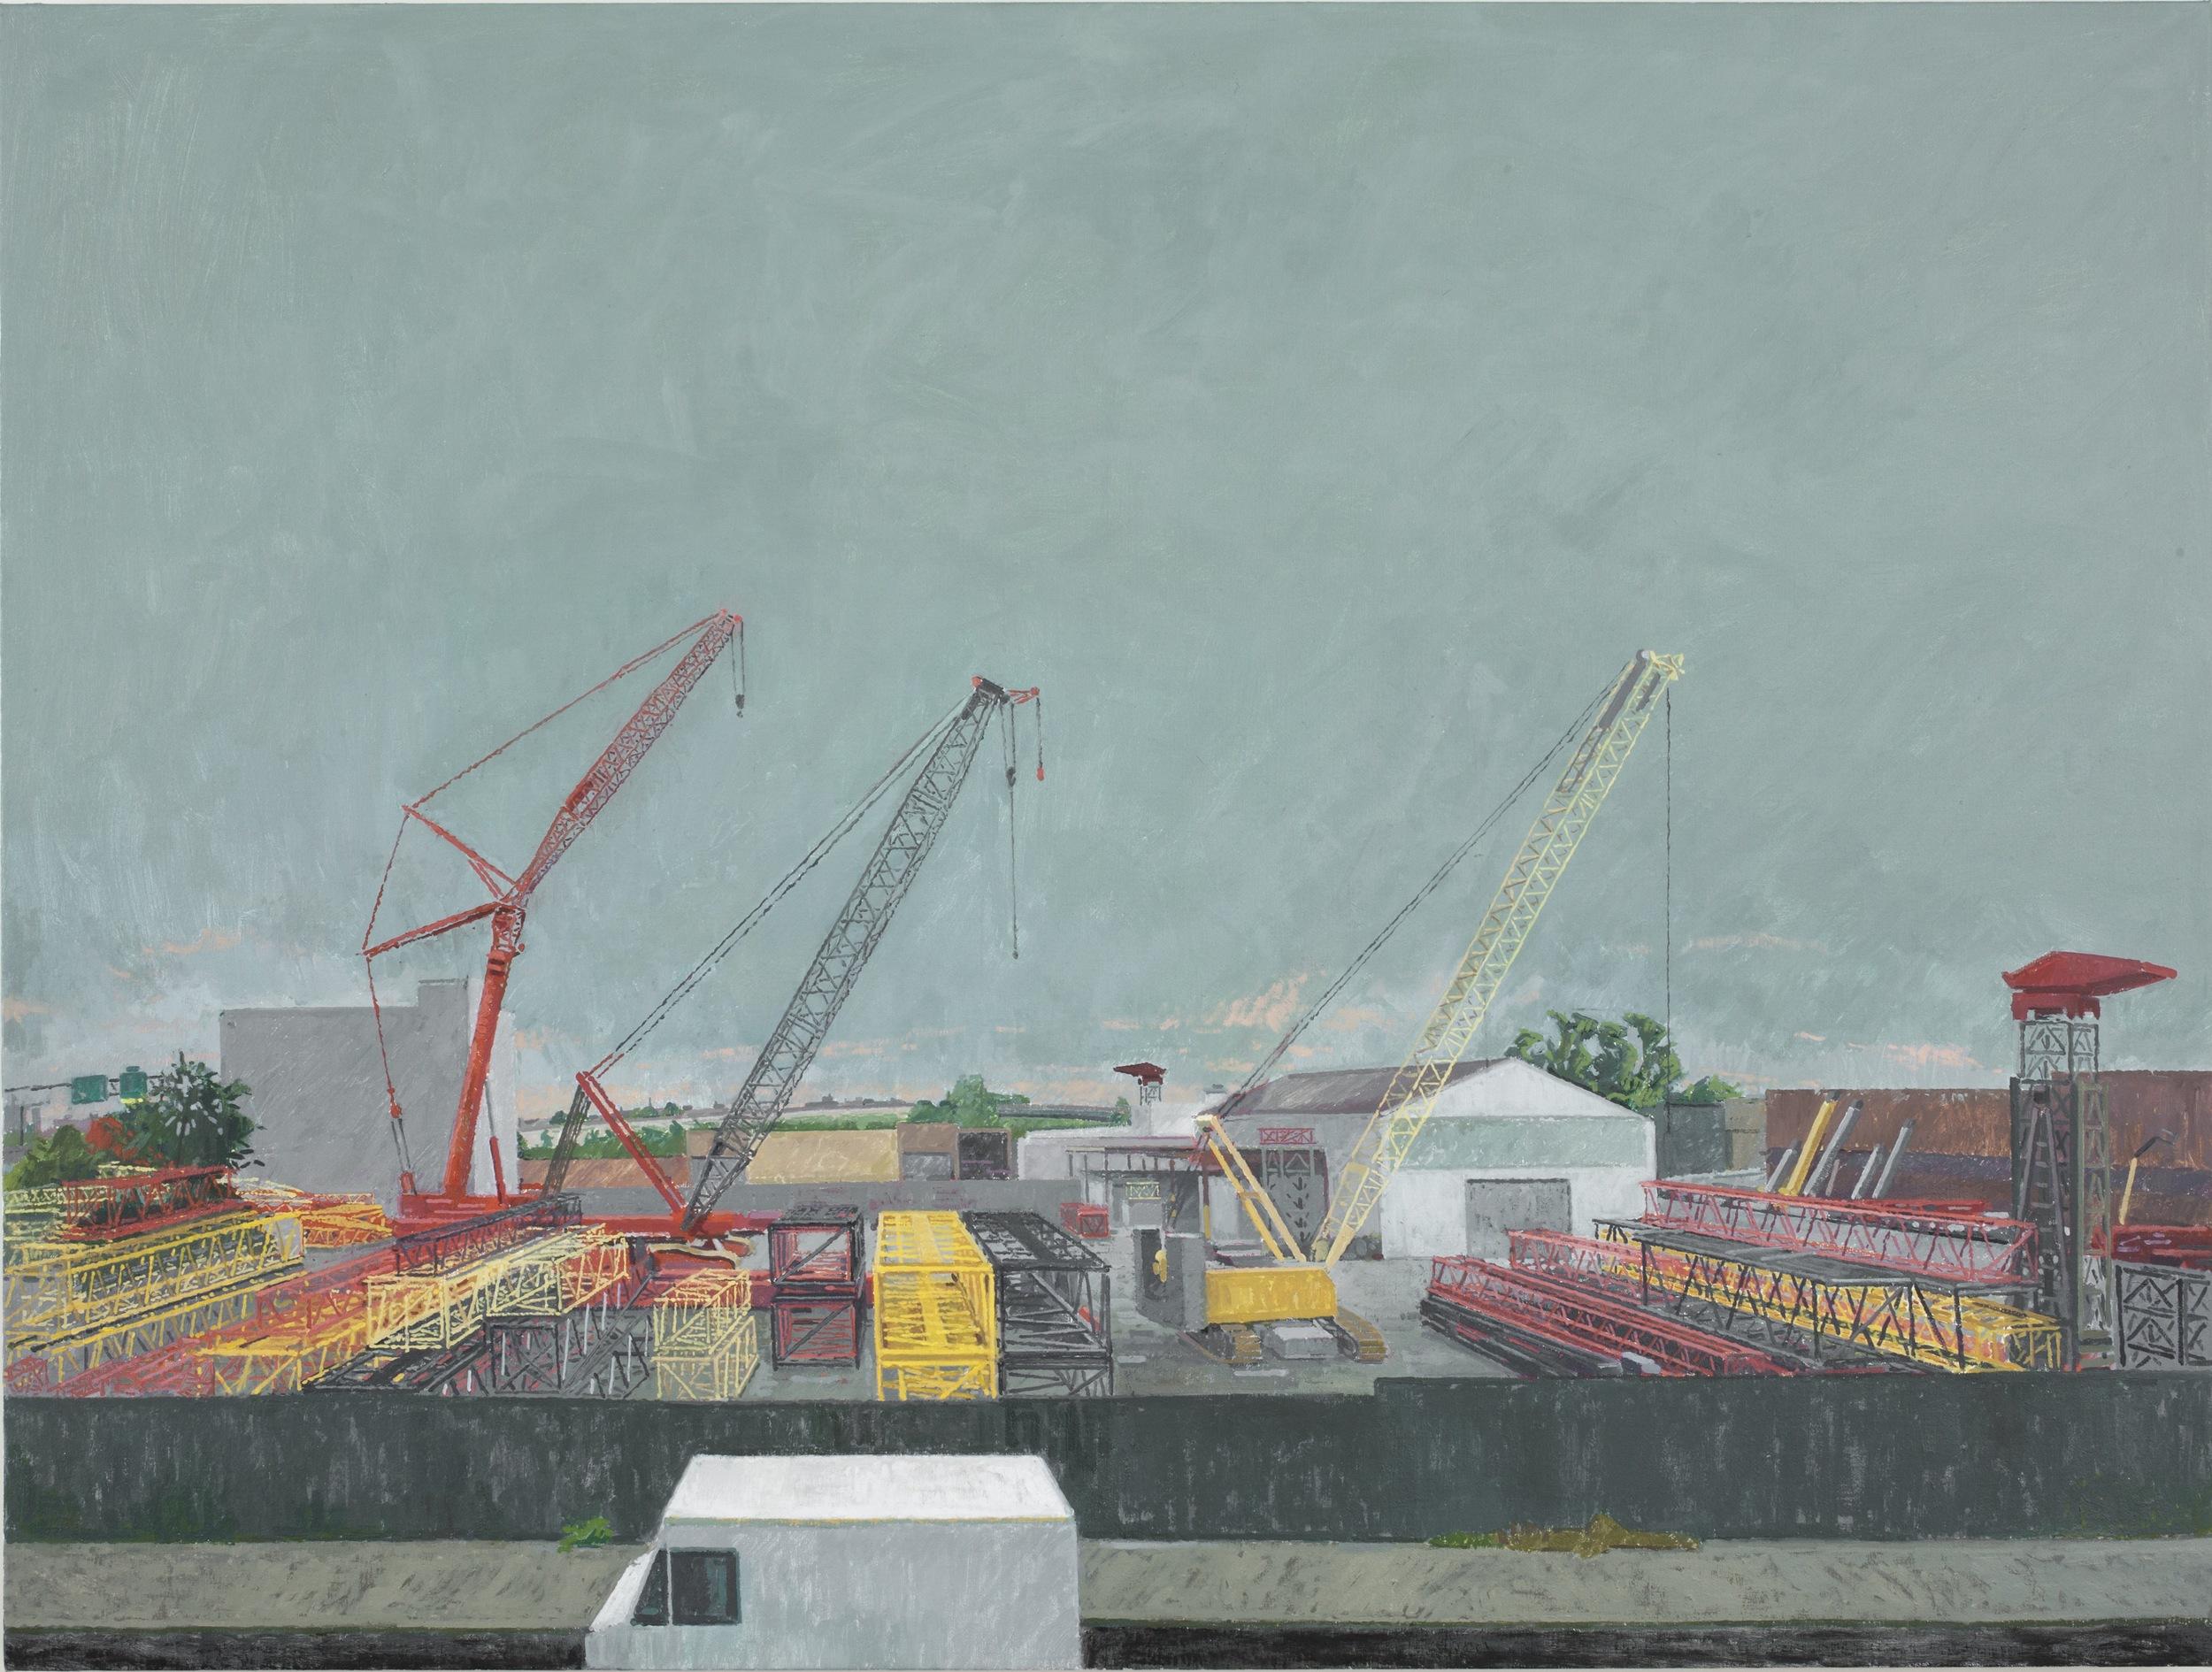 Three Cranes, 2012, oil on linen, 30 x 40 inches